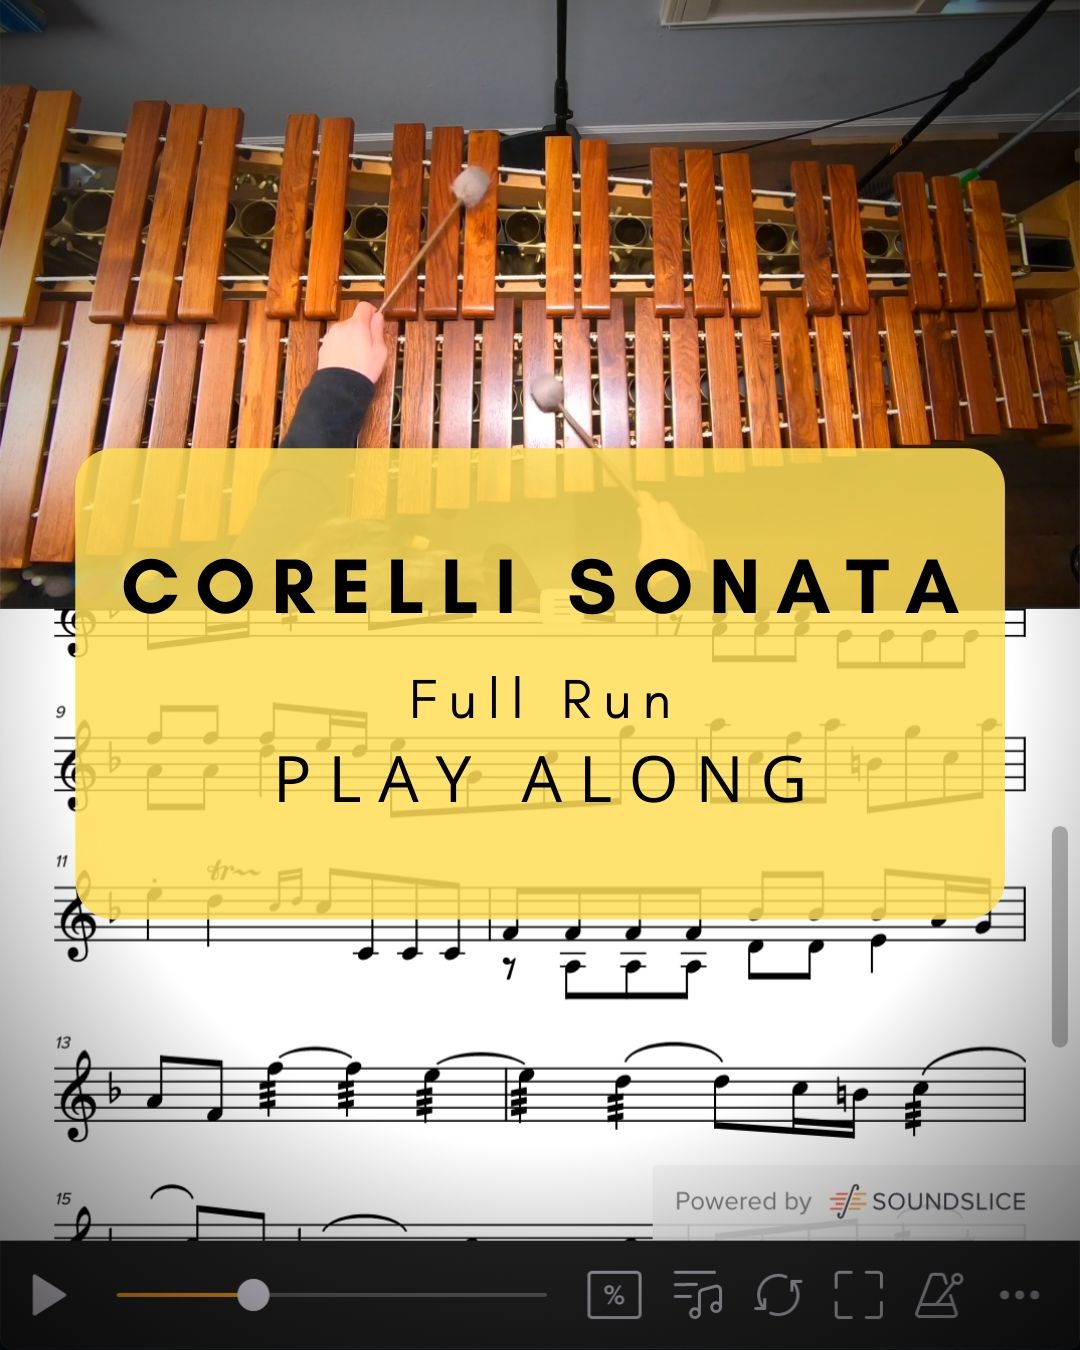 Corelli Sonata Full Run